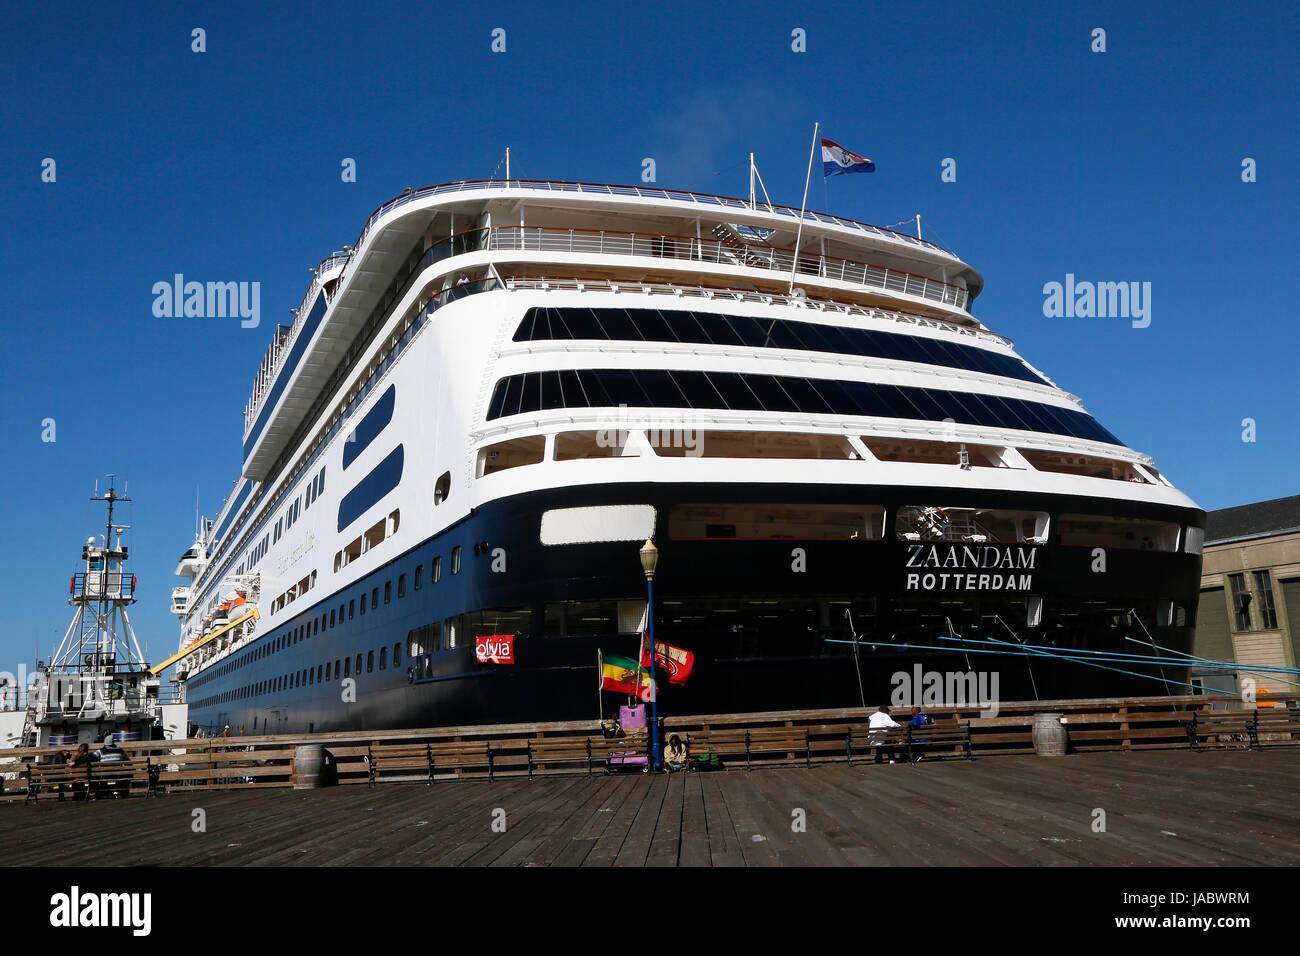 Holland America Line HAL Cruise Ship The Zaandam Docked In The - Zaandam ship